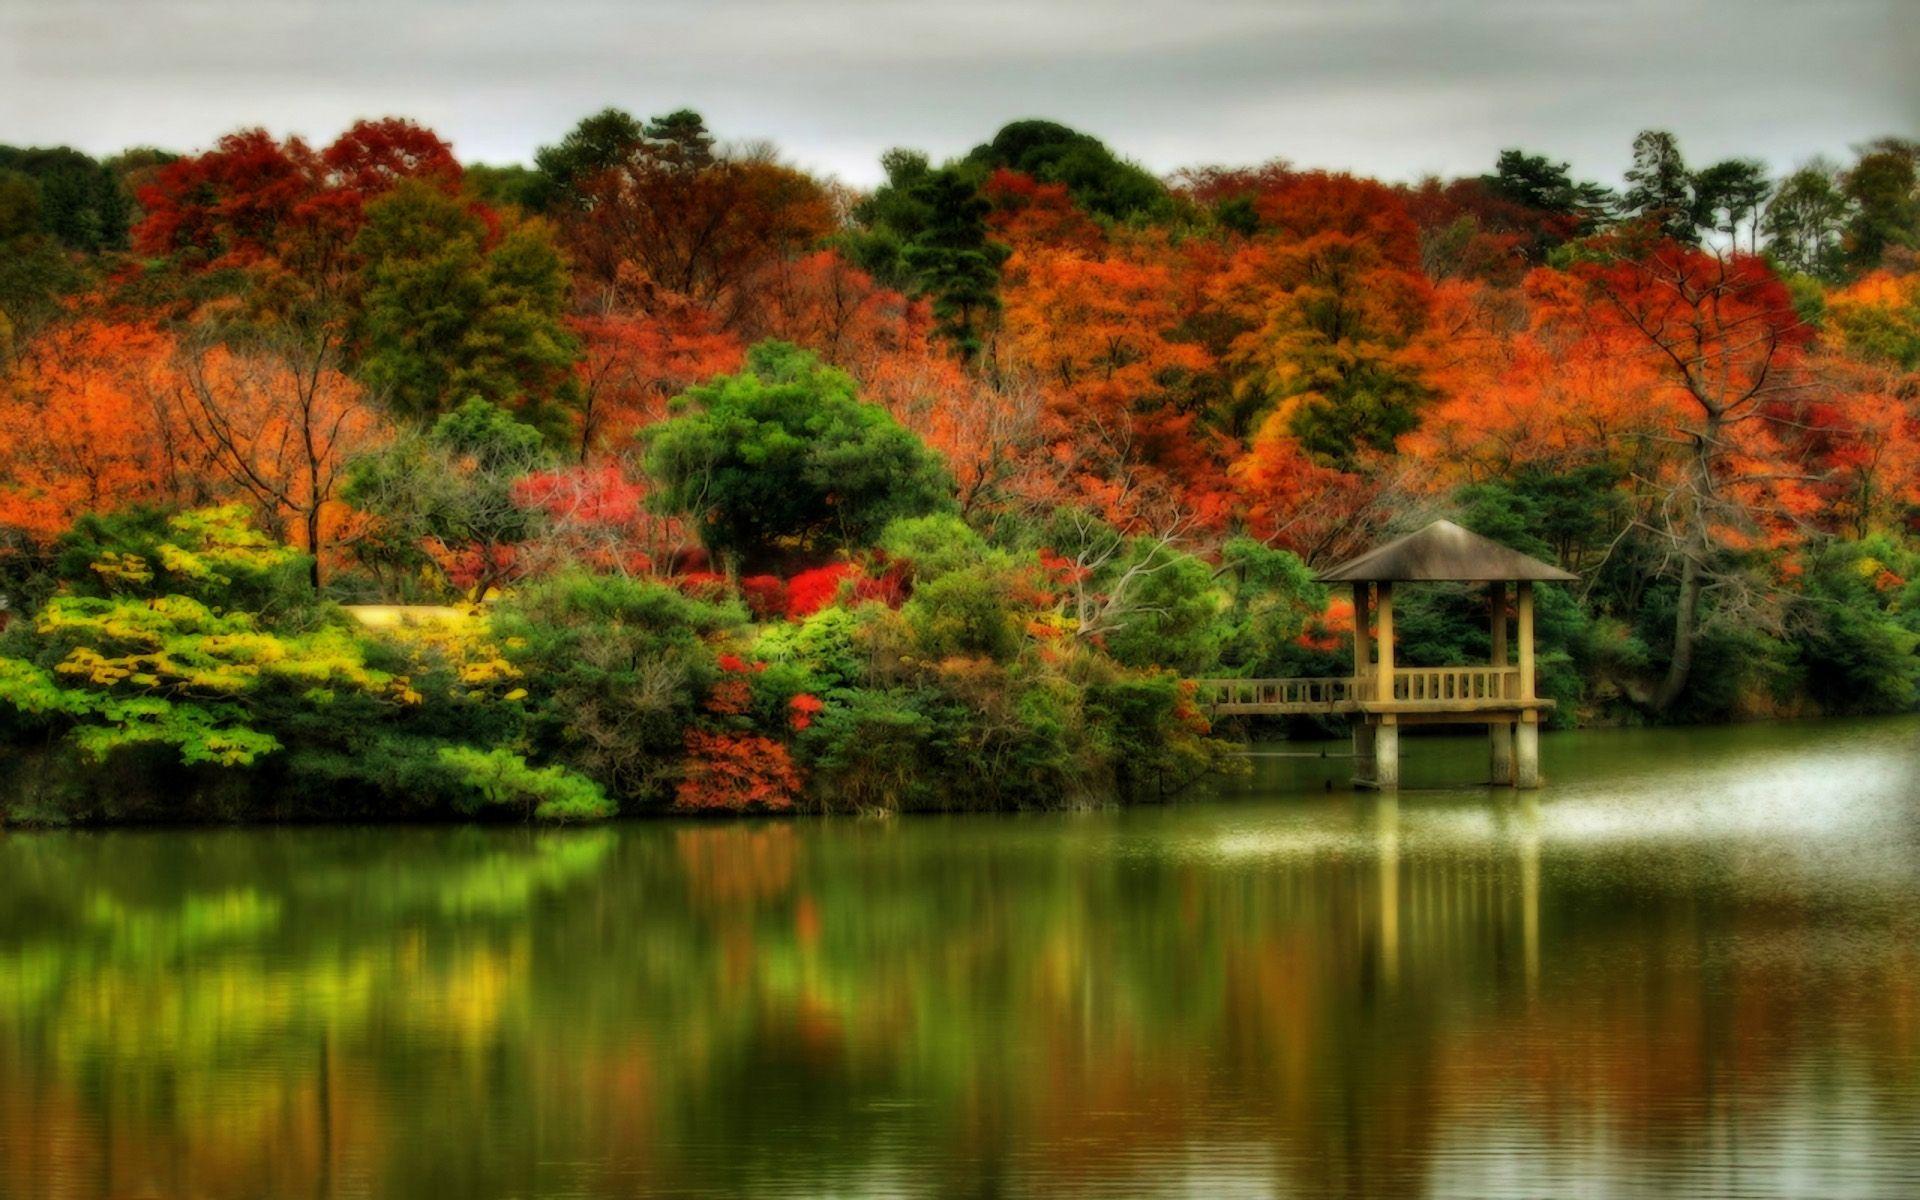 Beautiful Scenes For Desktop Beautiful Autumn Scenes 1920x1200 Wallpapers 1920x1200 Wallpapers Scenery Wallpaper Autumn Scenery Fall Scenery Pictures